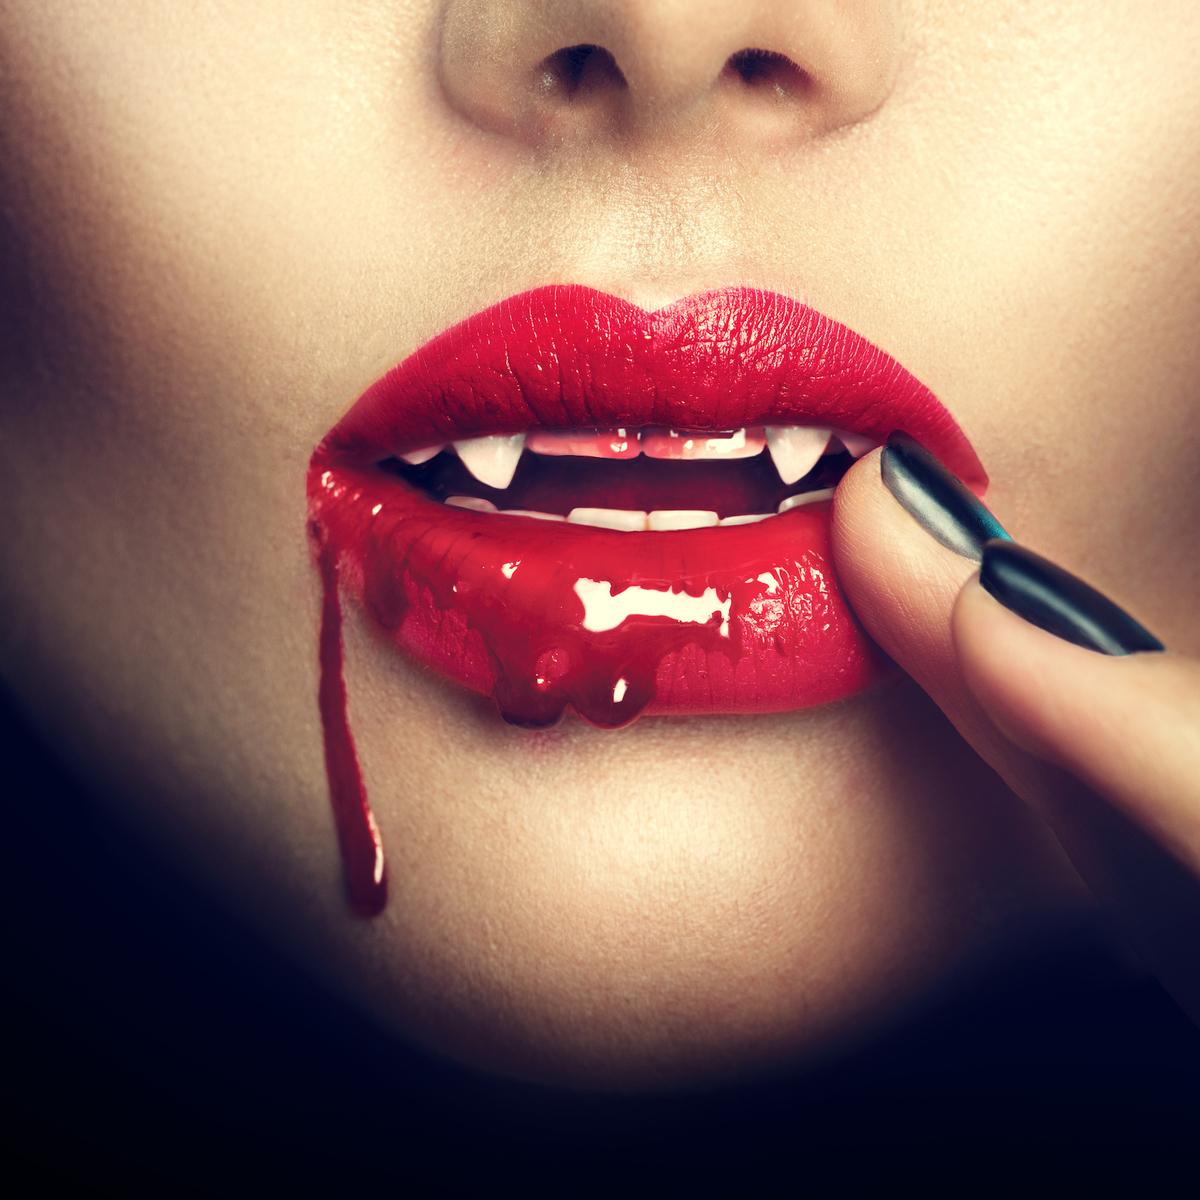 Blood transfusion essay